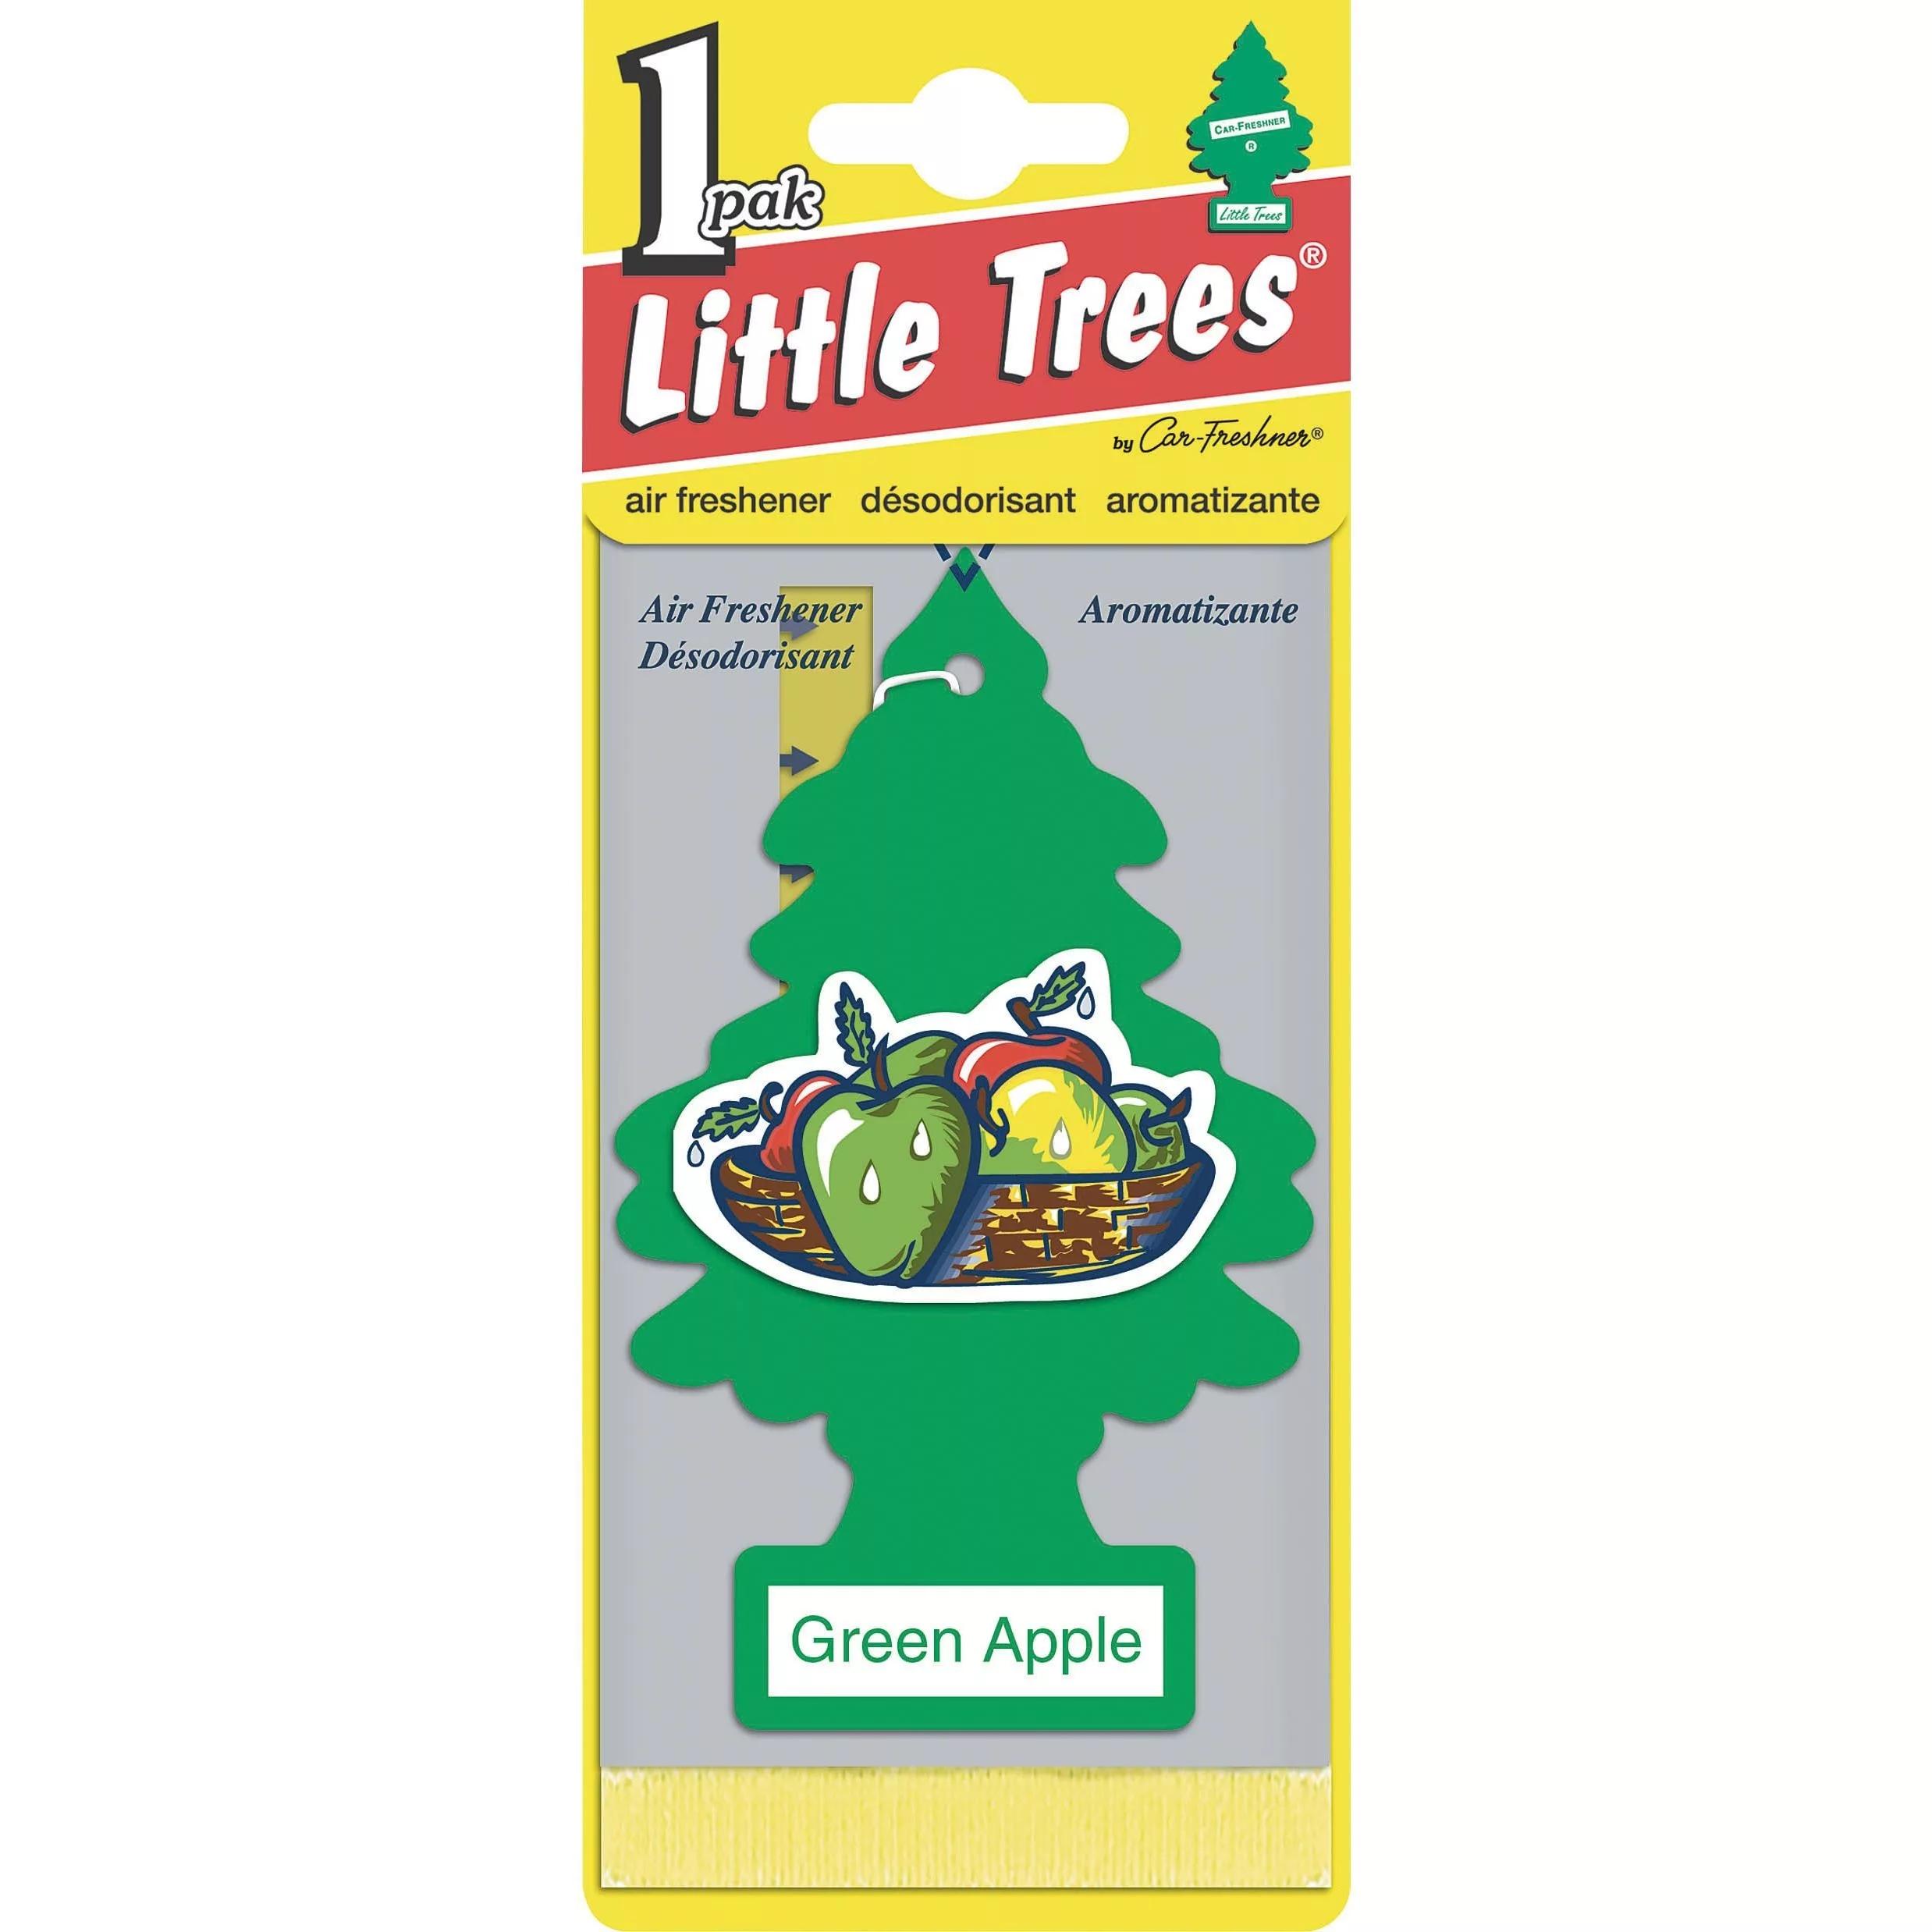 Автомобильный ароматизатор Car-Freshner Little Trees, зеленое яблоко, США автомобильный ароматизатор car freshner little trees зеленое яблоко сша